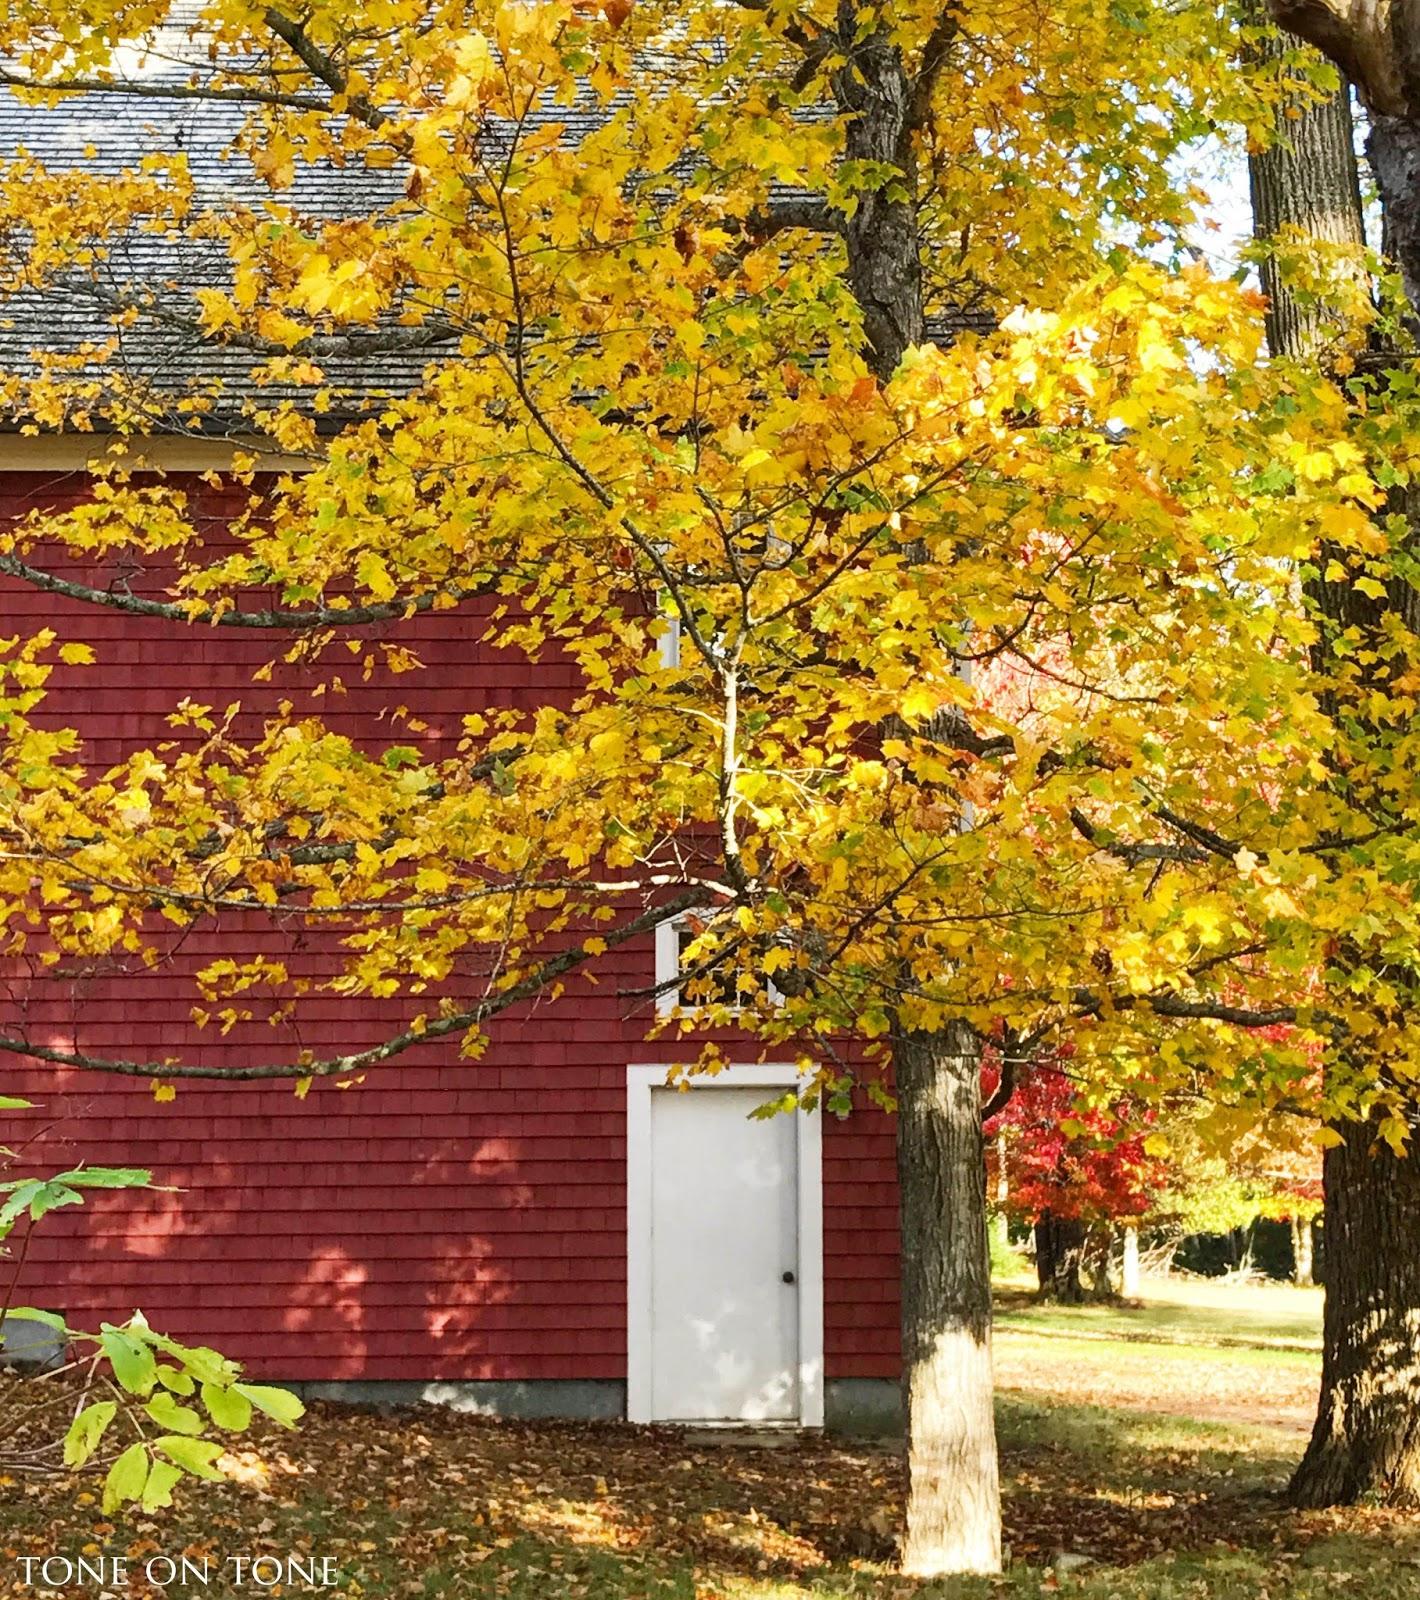 Tone on Tone: Autumn in Maine